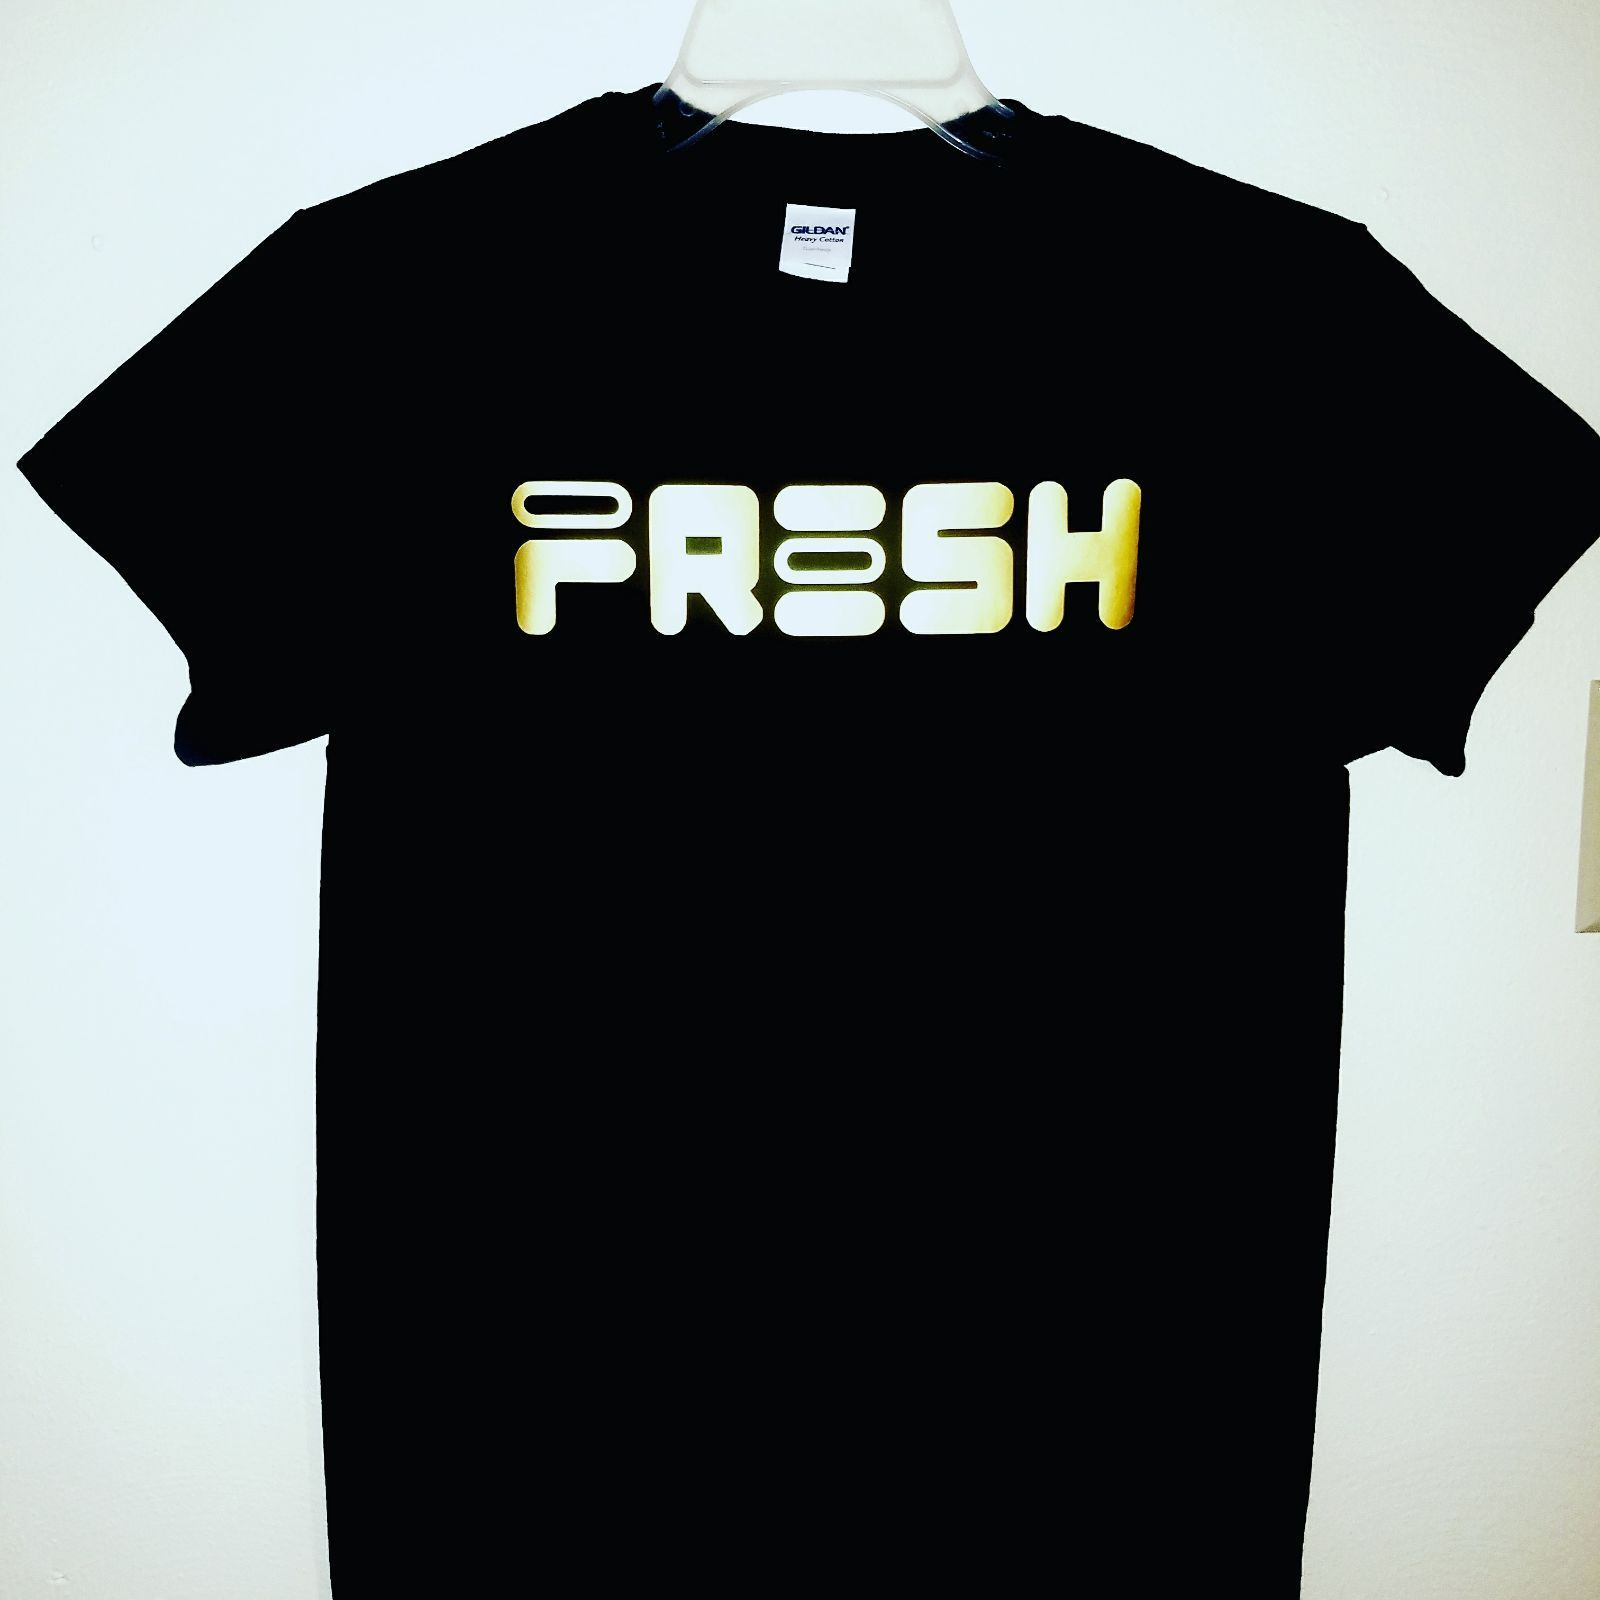 Brand new fresh t shirt mercari buy sell things you love for Fresh brand t shirts